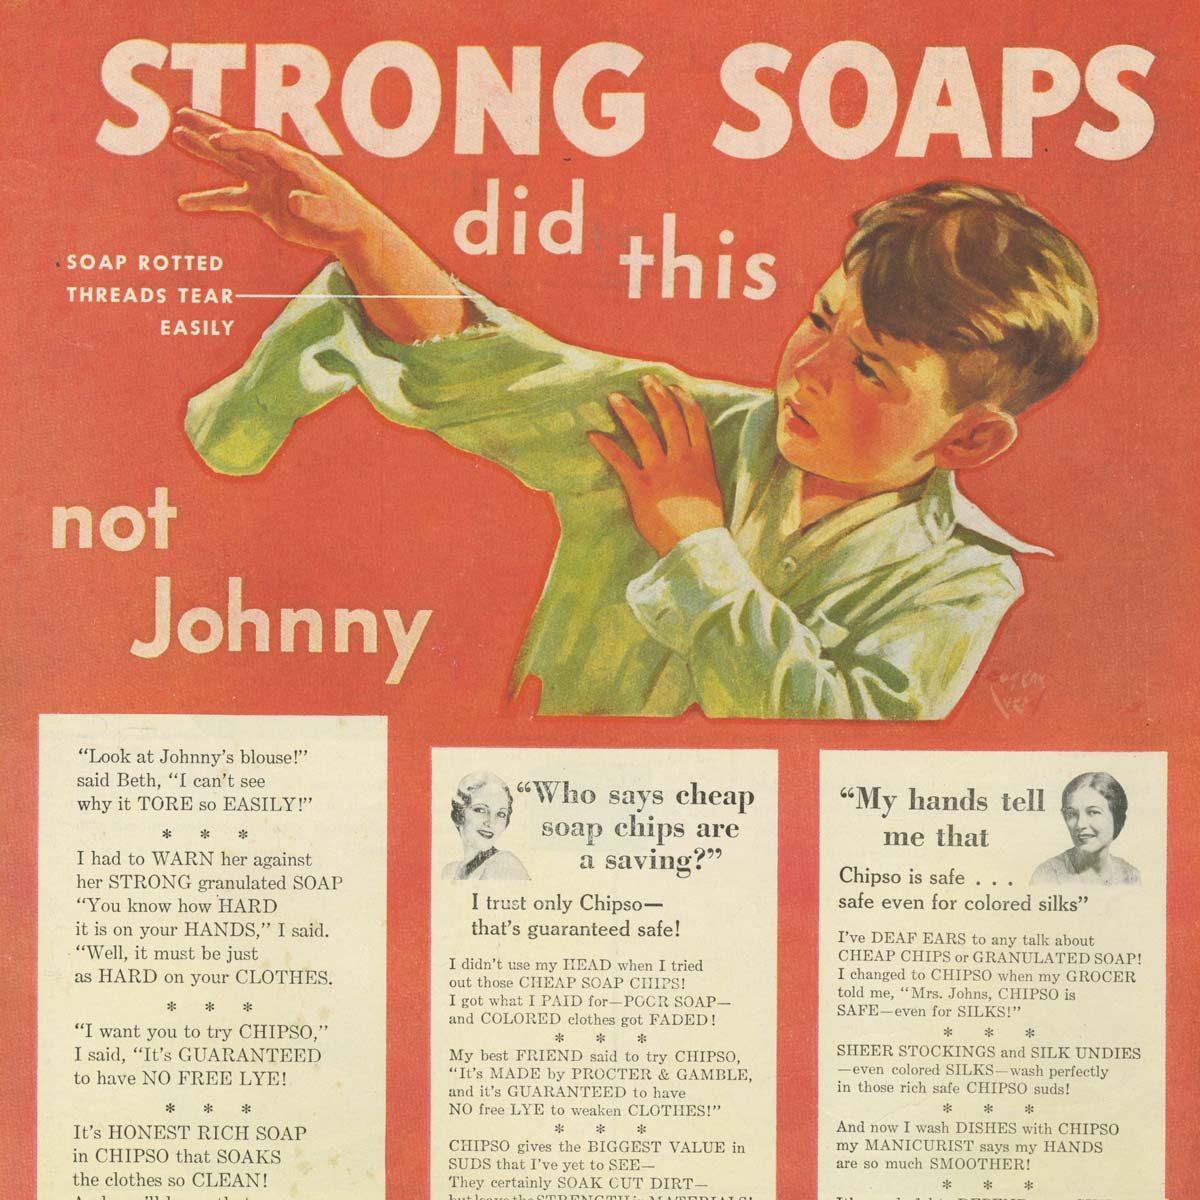 Vintage laundry soap ad